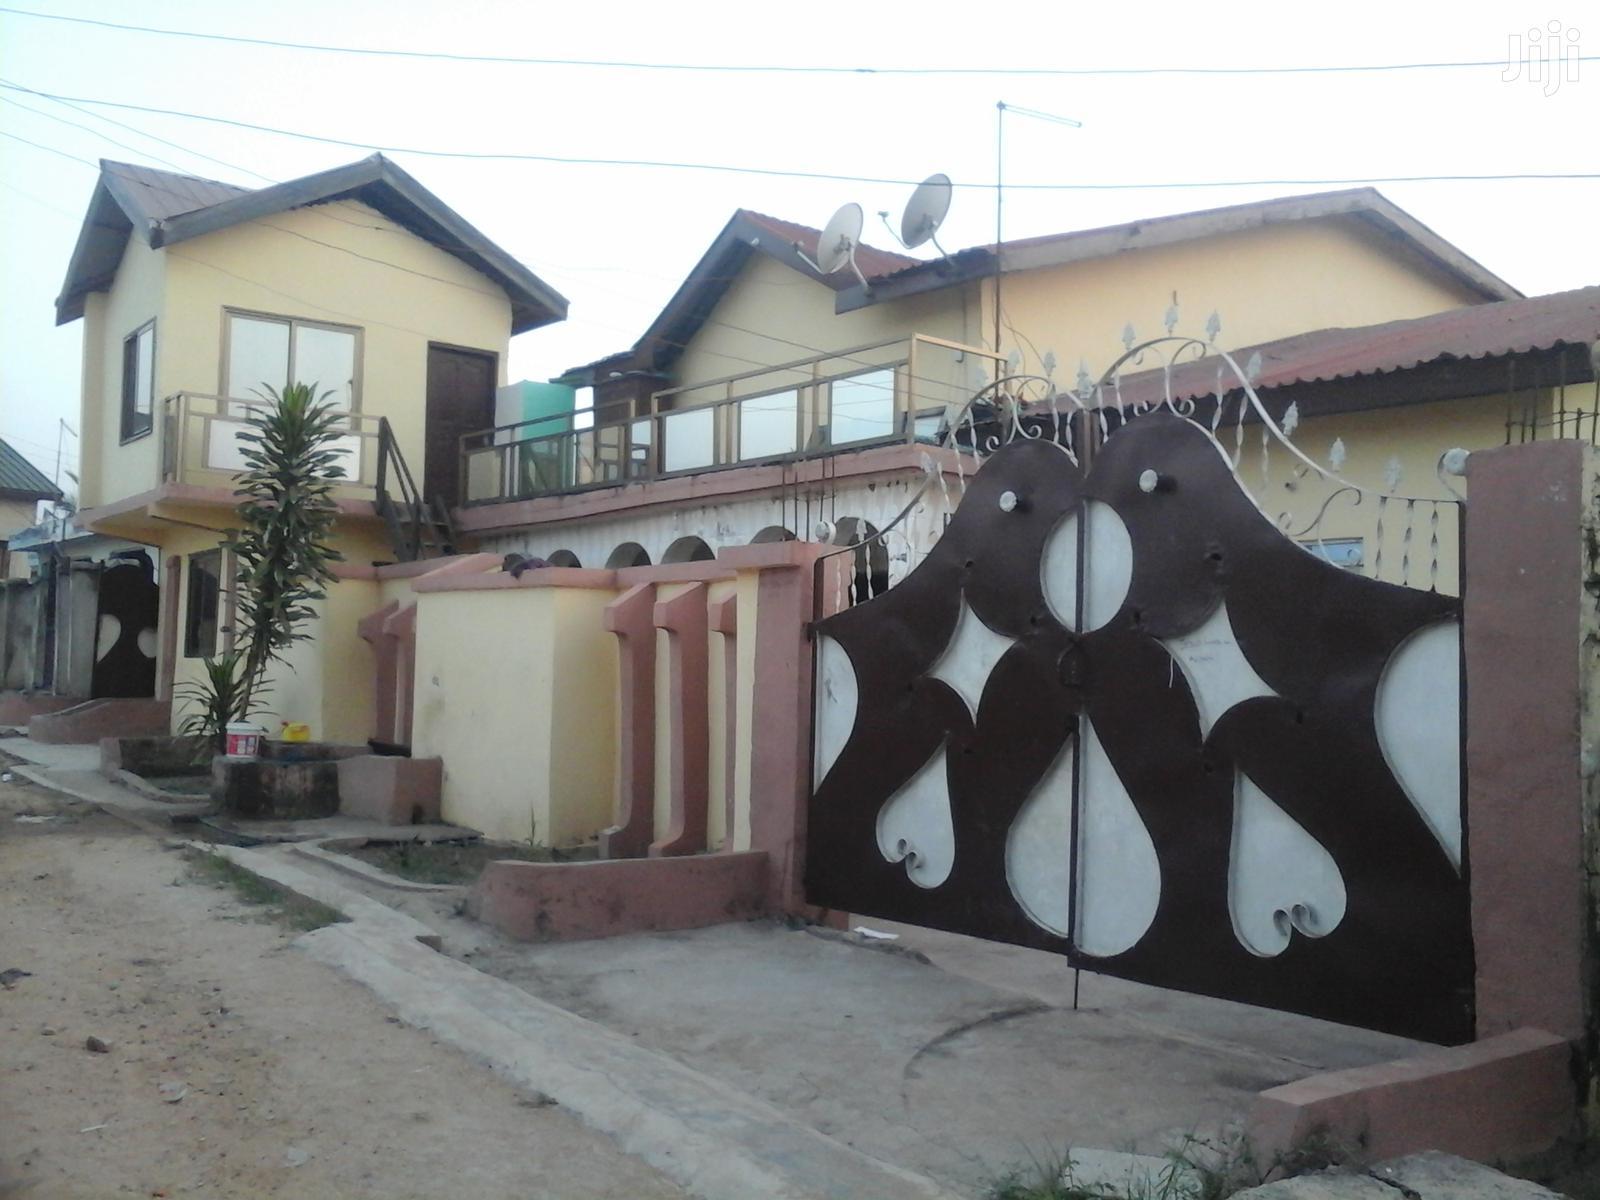 9-Bedroom House for Sale at Sokoban New Site, Kumasi | Houses & Apartments For Sale for sale in Kumasi Metropolitan, Ashanti, Ghana